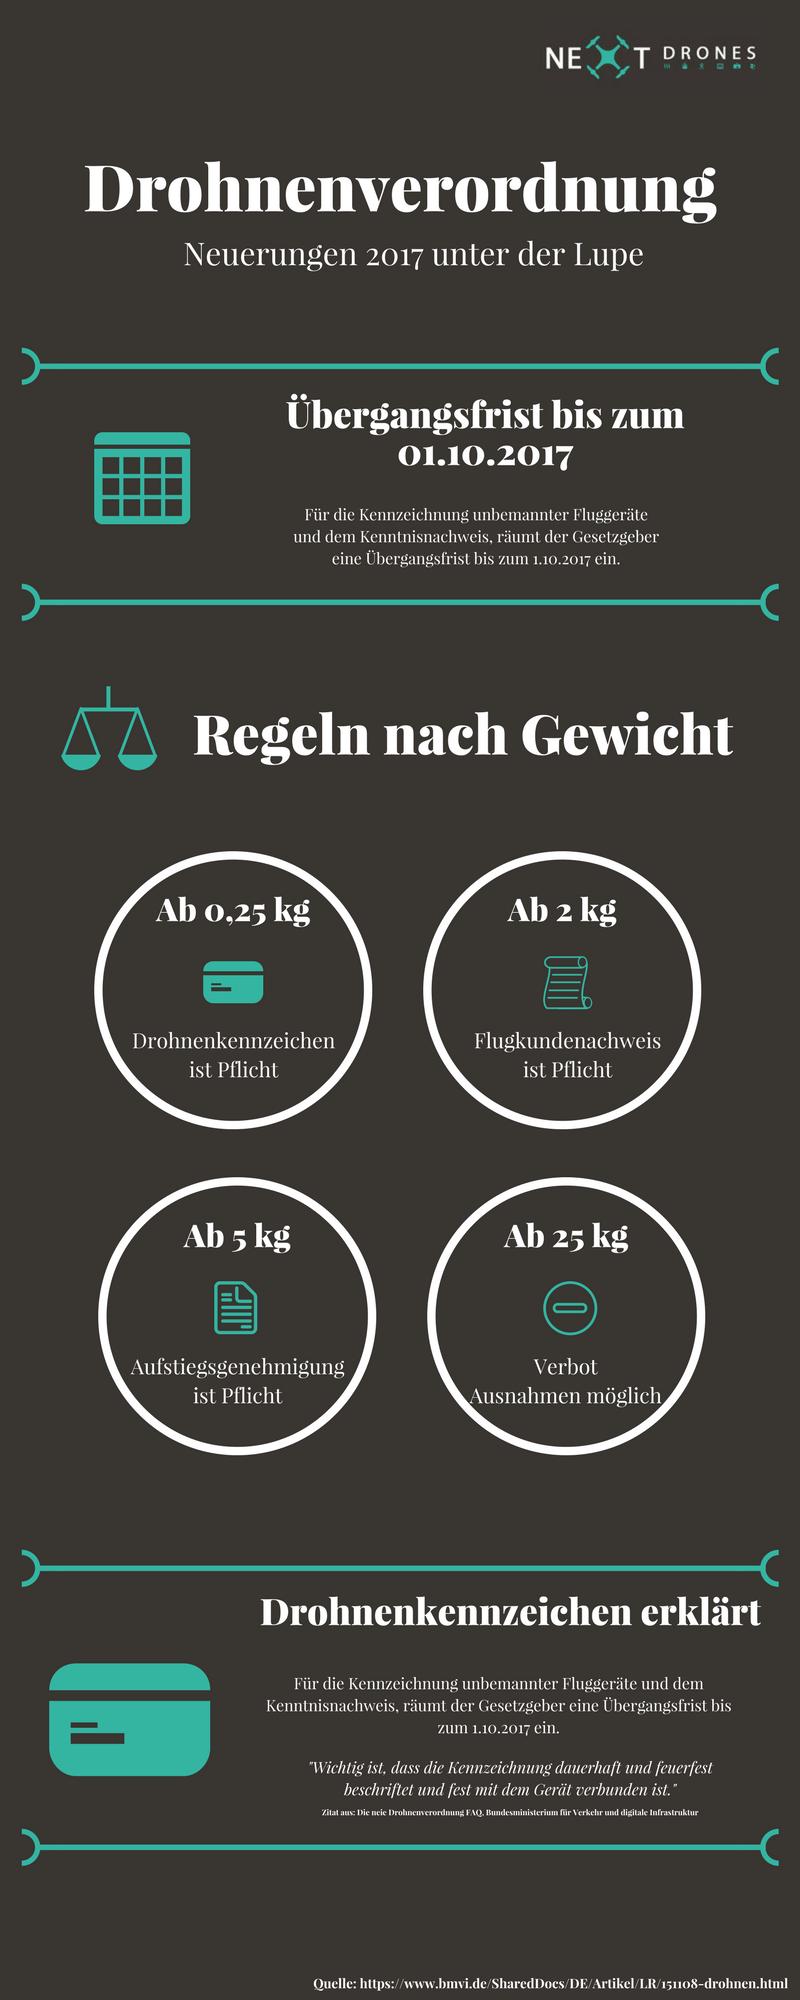 Drohnenverordnung 2017 Infografik